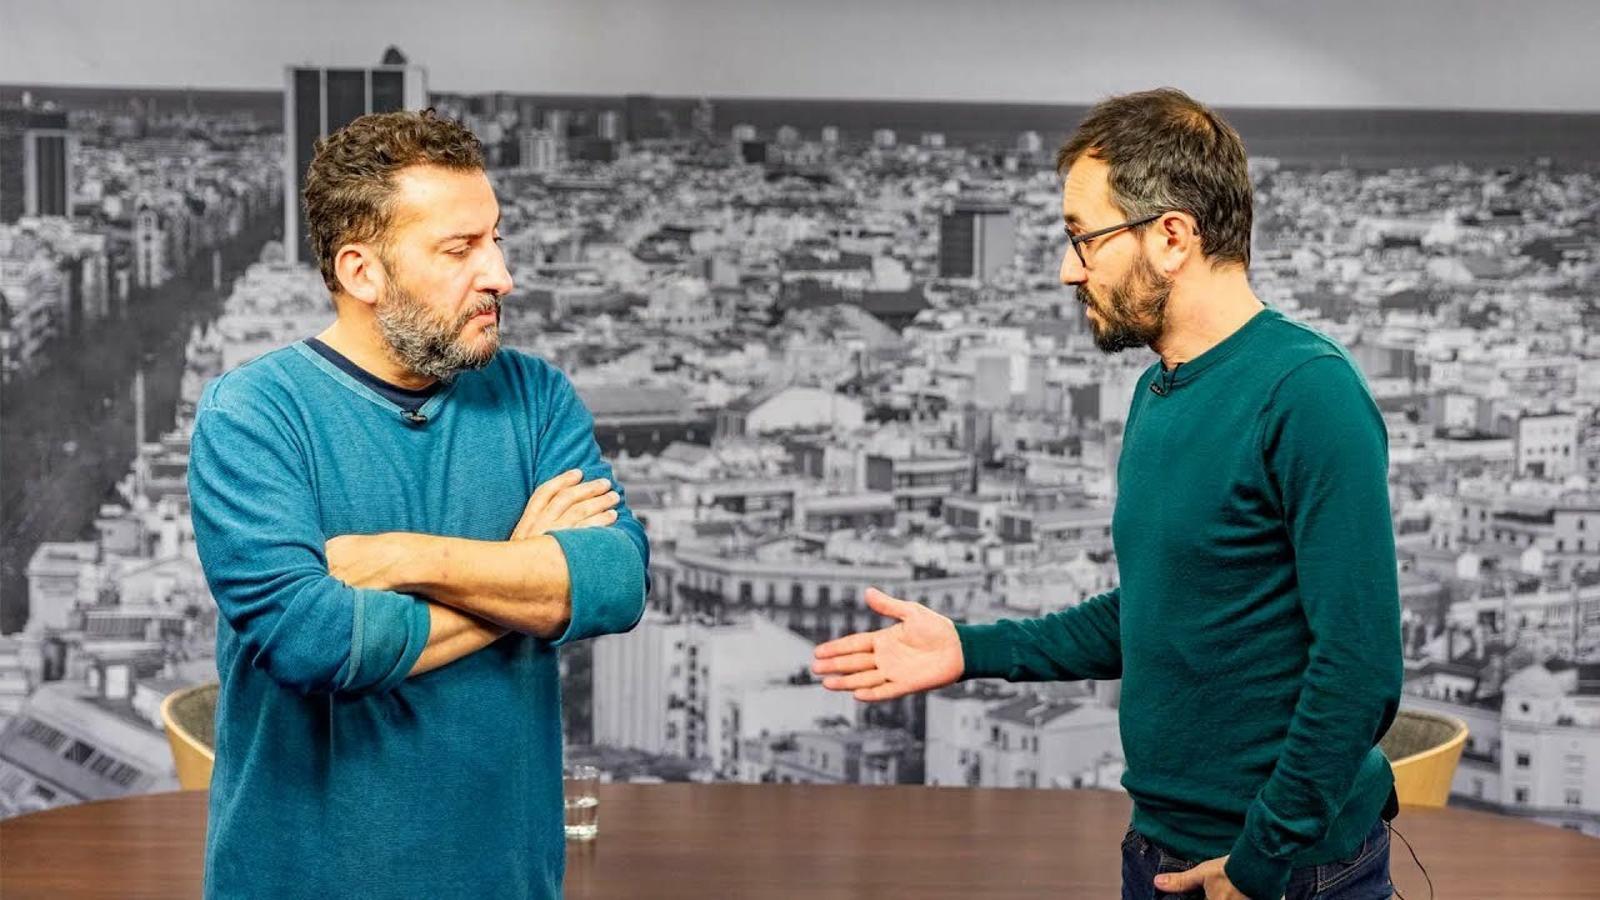 Toni Soler entrevista a Jair Domínguez